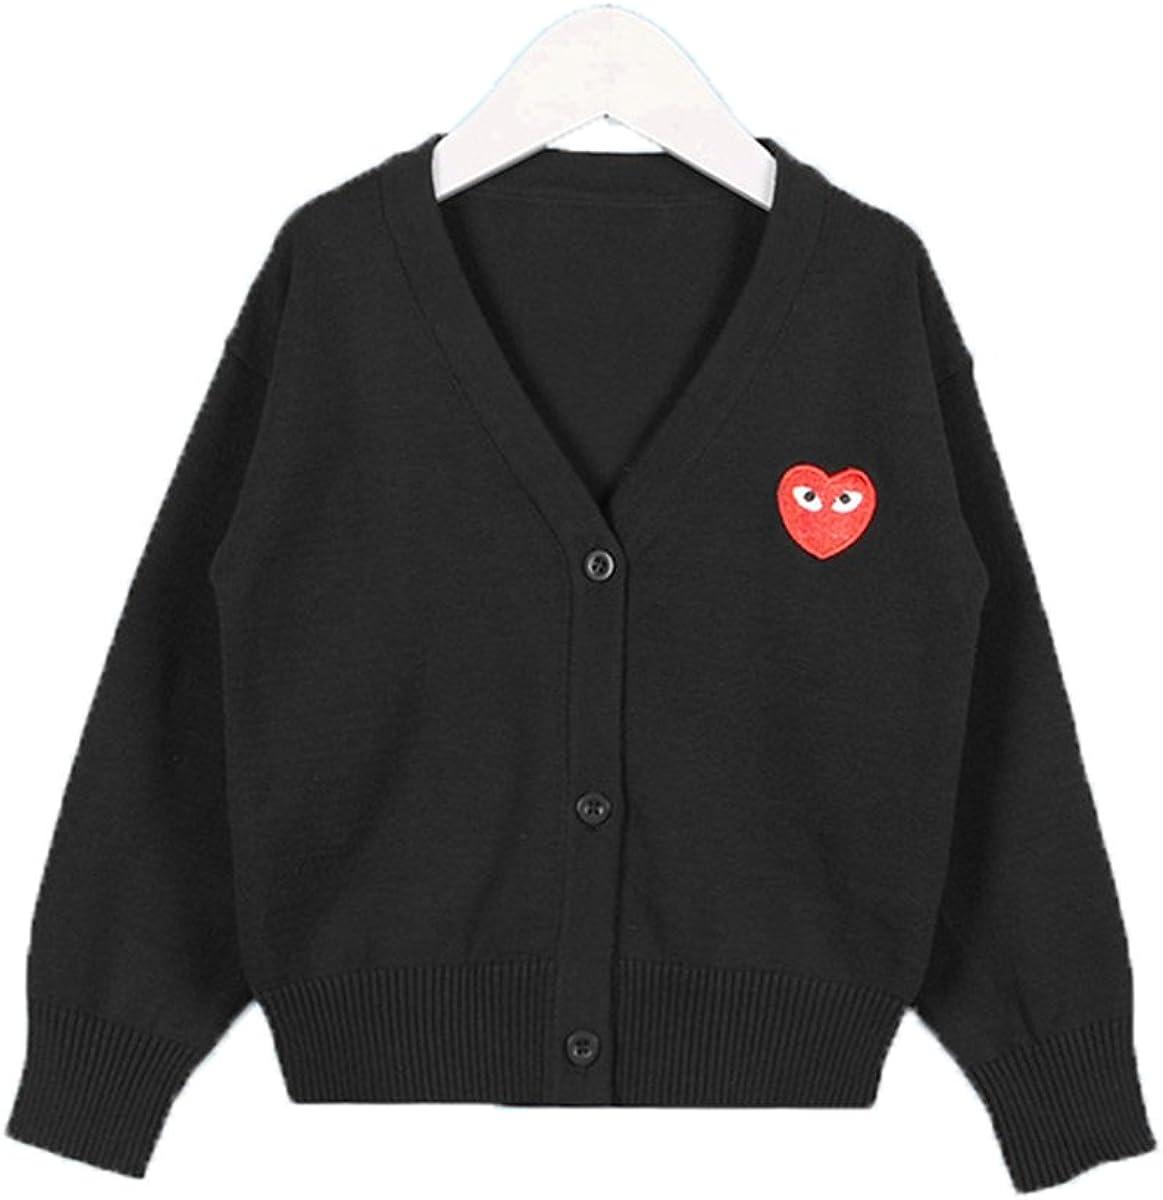 Lemonkid Trendy Unisex Kids V Neck Heart Embroidery Cotton Knit Cardigan Sweater